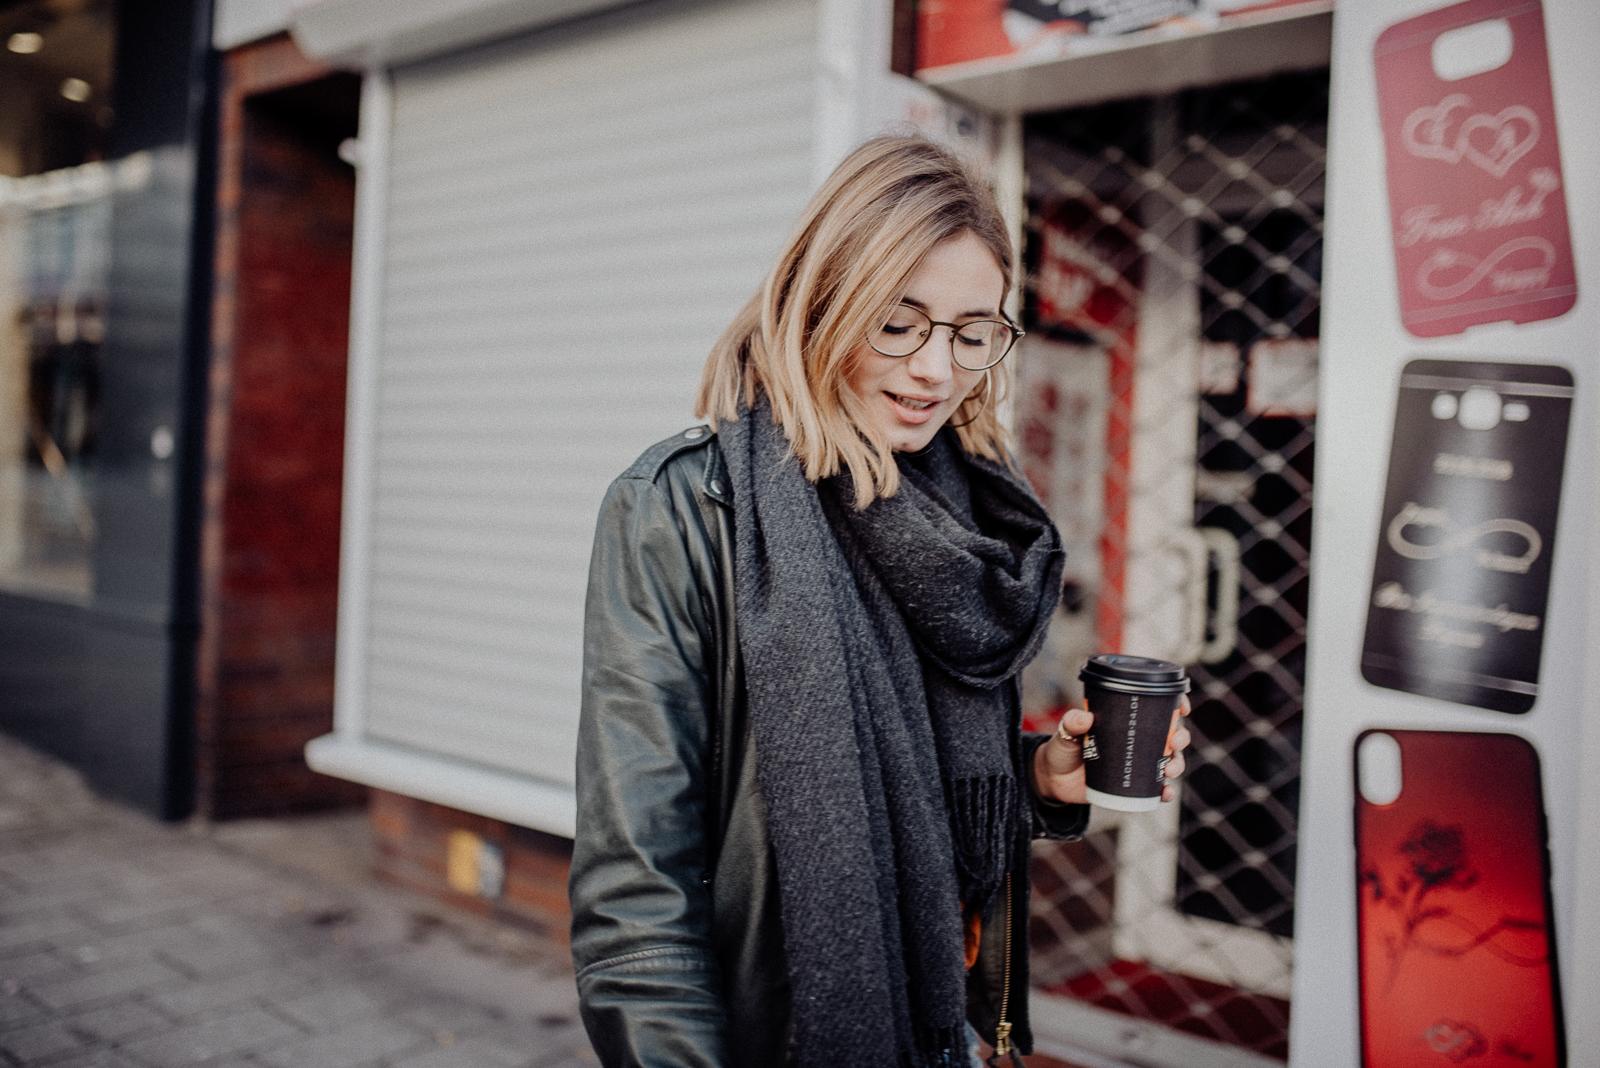 041-designparaplus-fotografin-witten-portrait-shooting-downtown